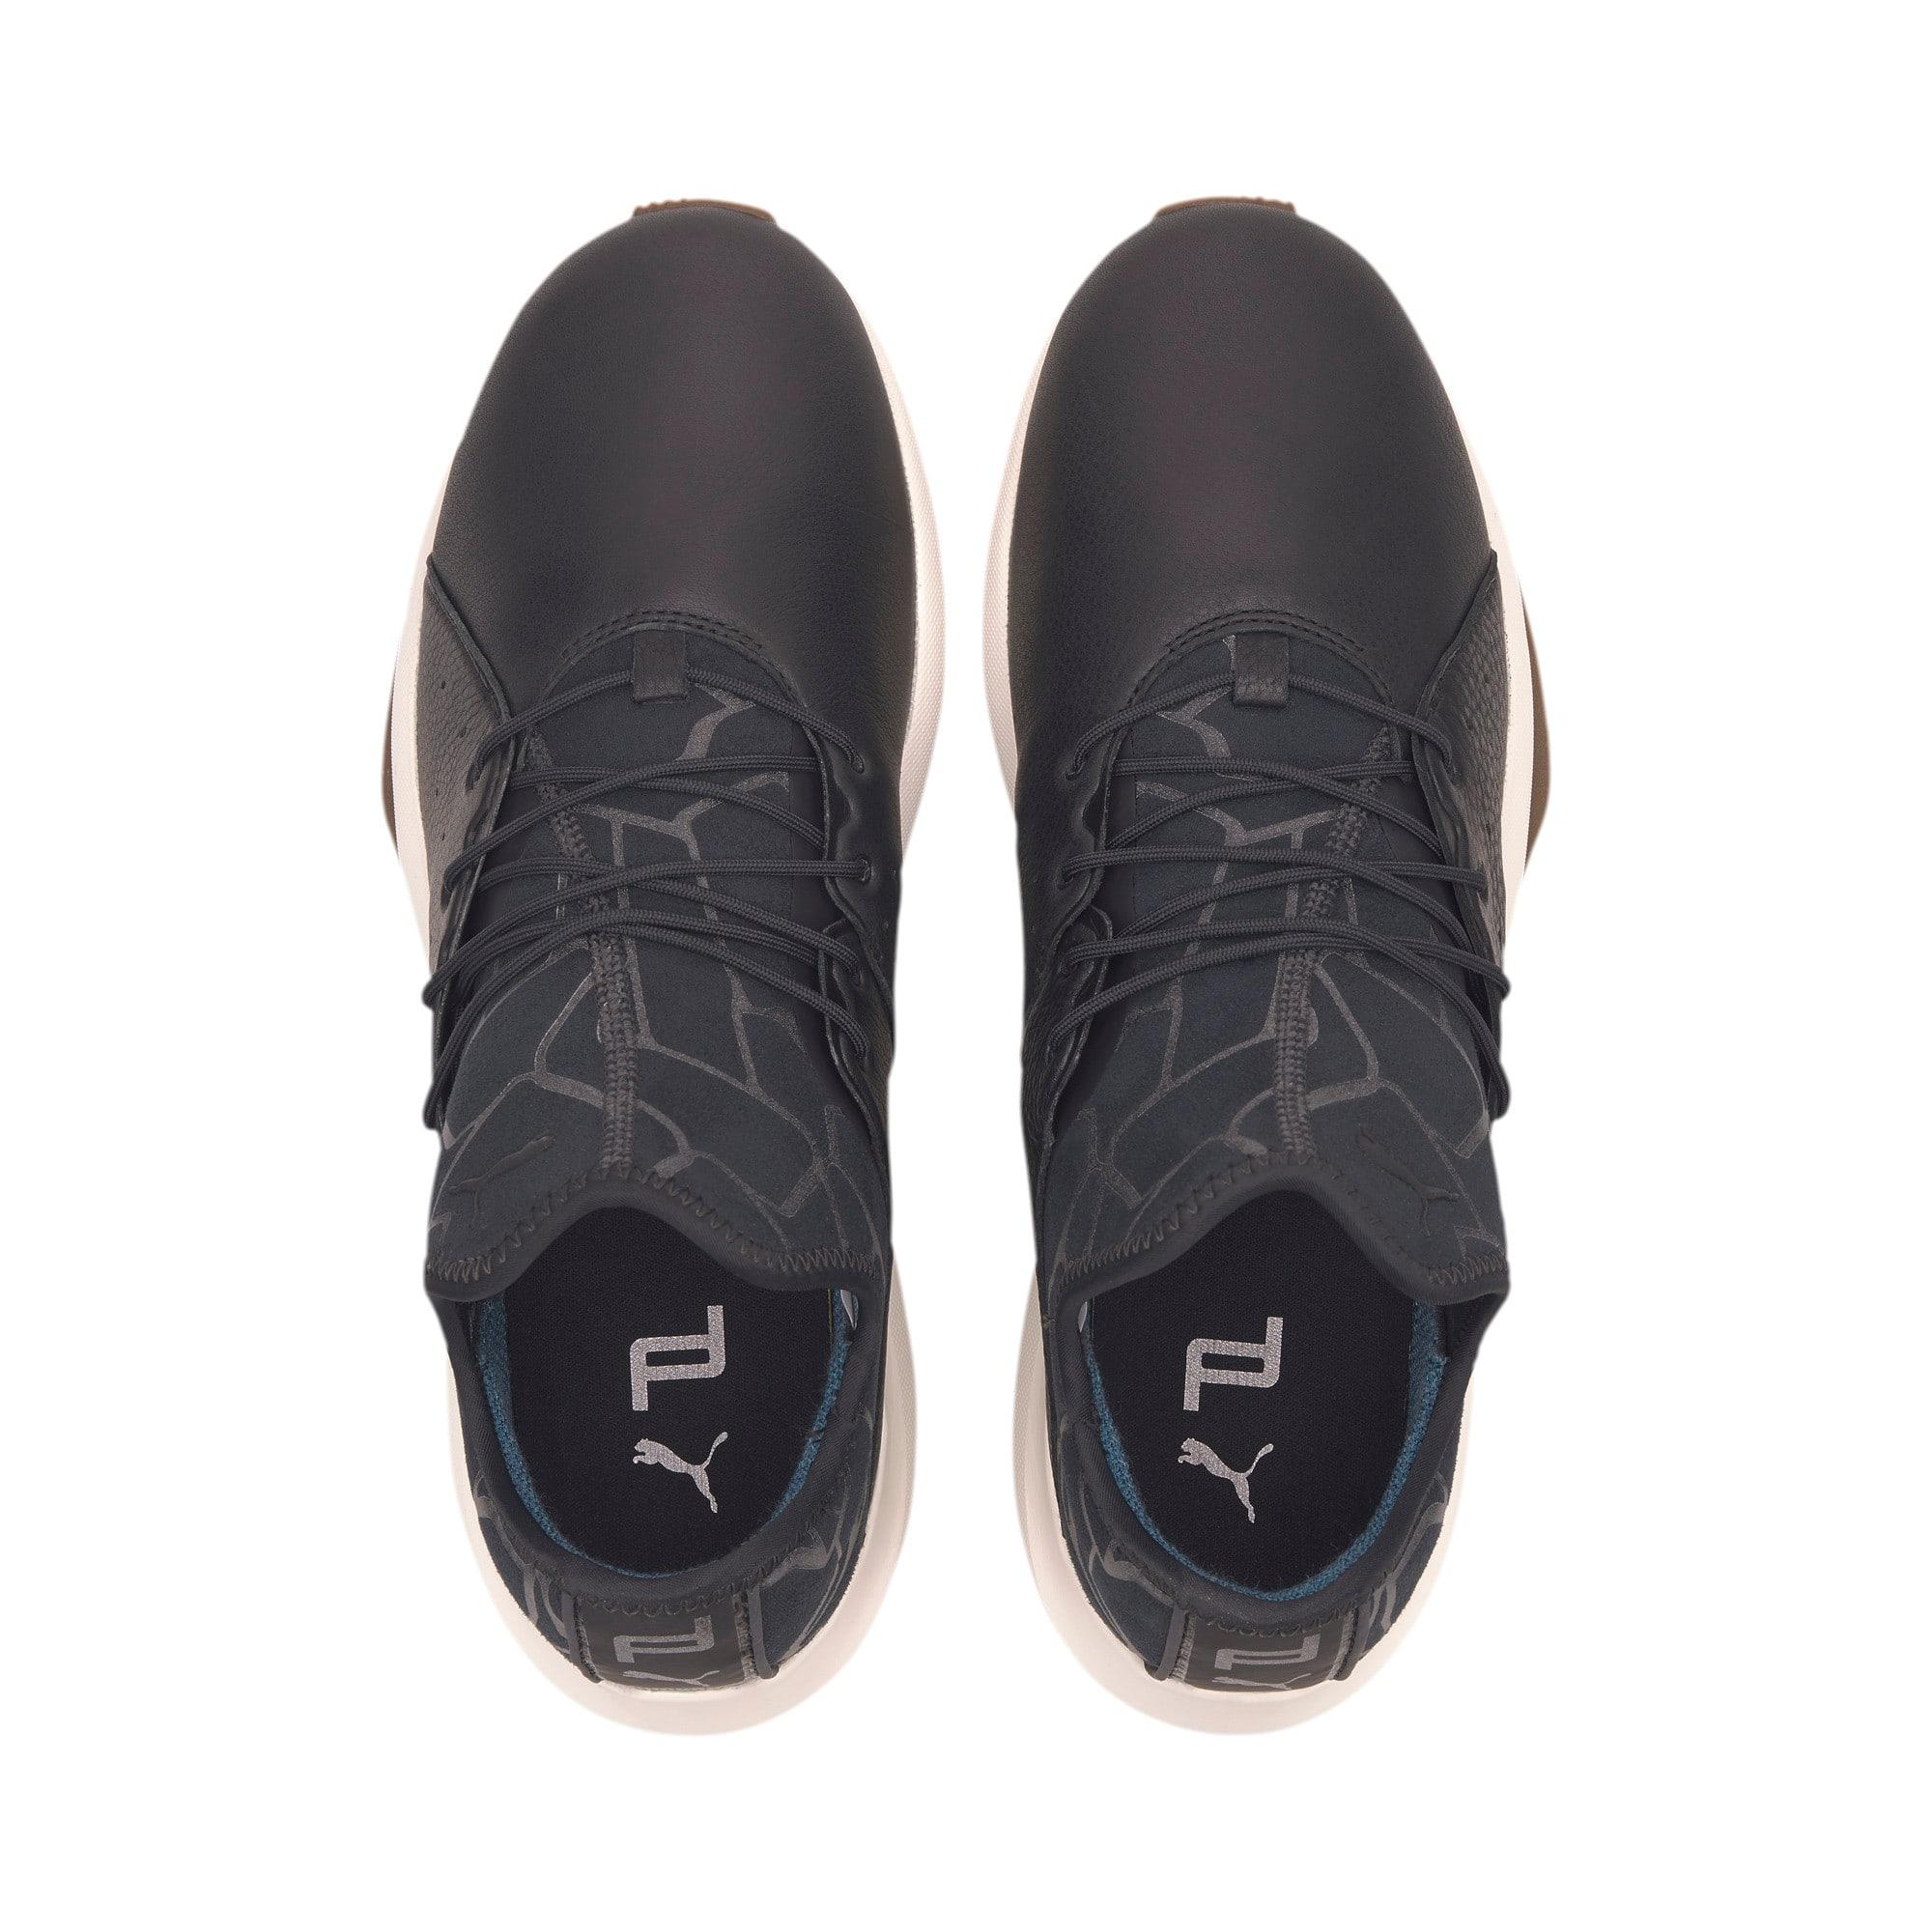 Imagen en miniatura 7 de Zapatillas de hombre Porsche Design Evo Cat II, JetBlack-JetBlack-WhisperWht, mediana